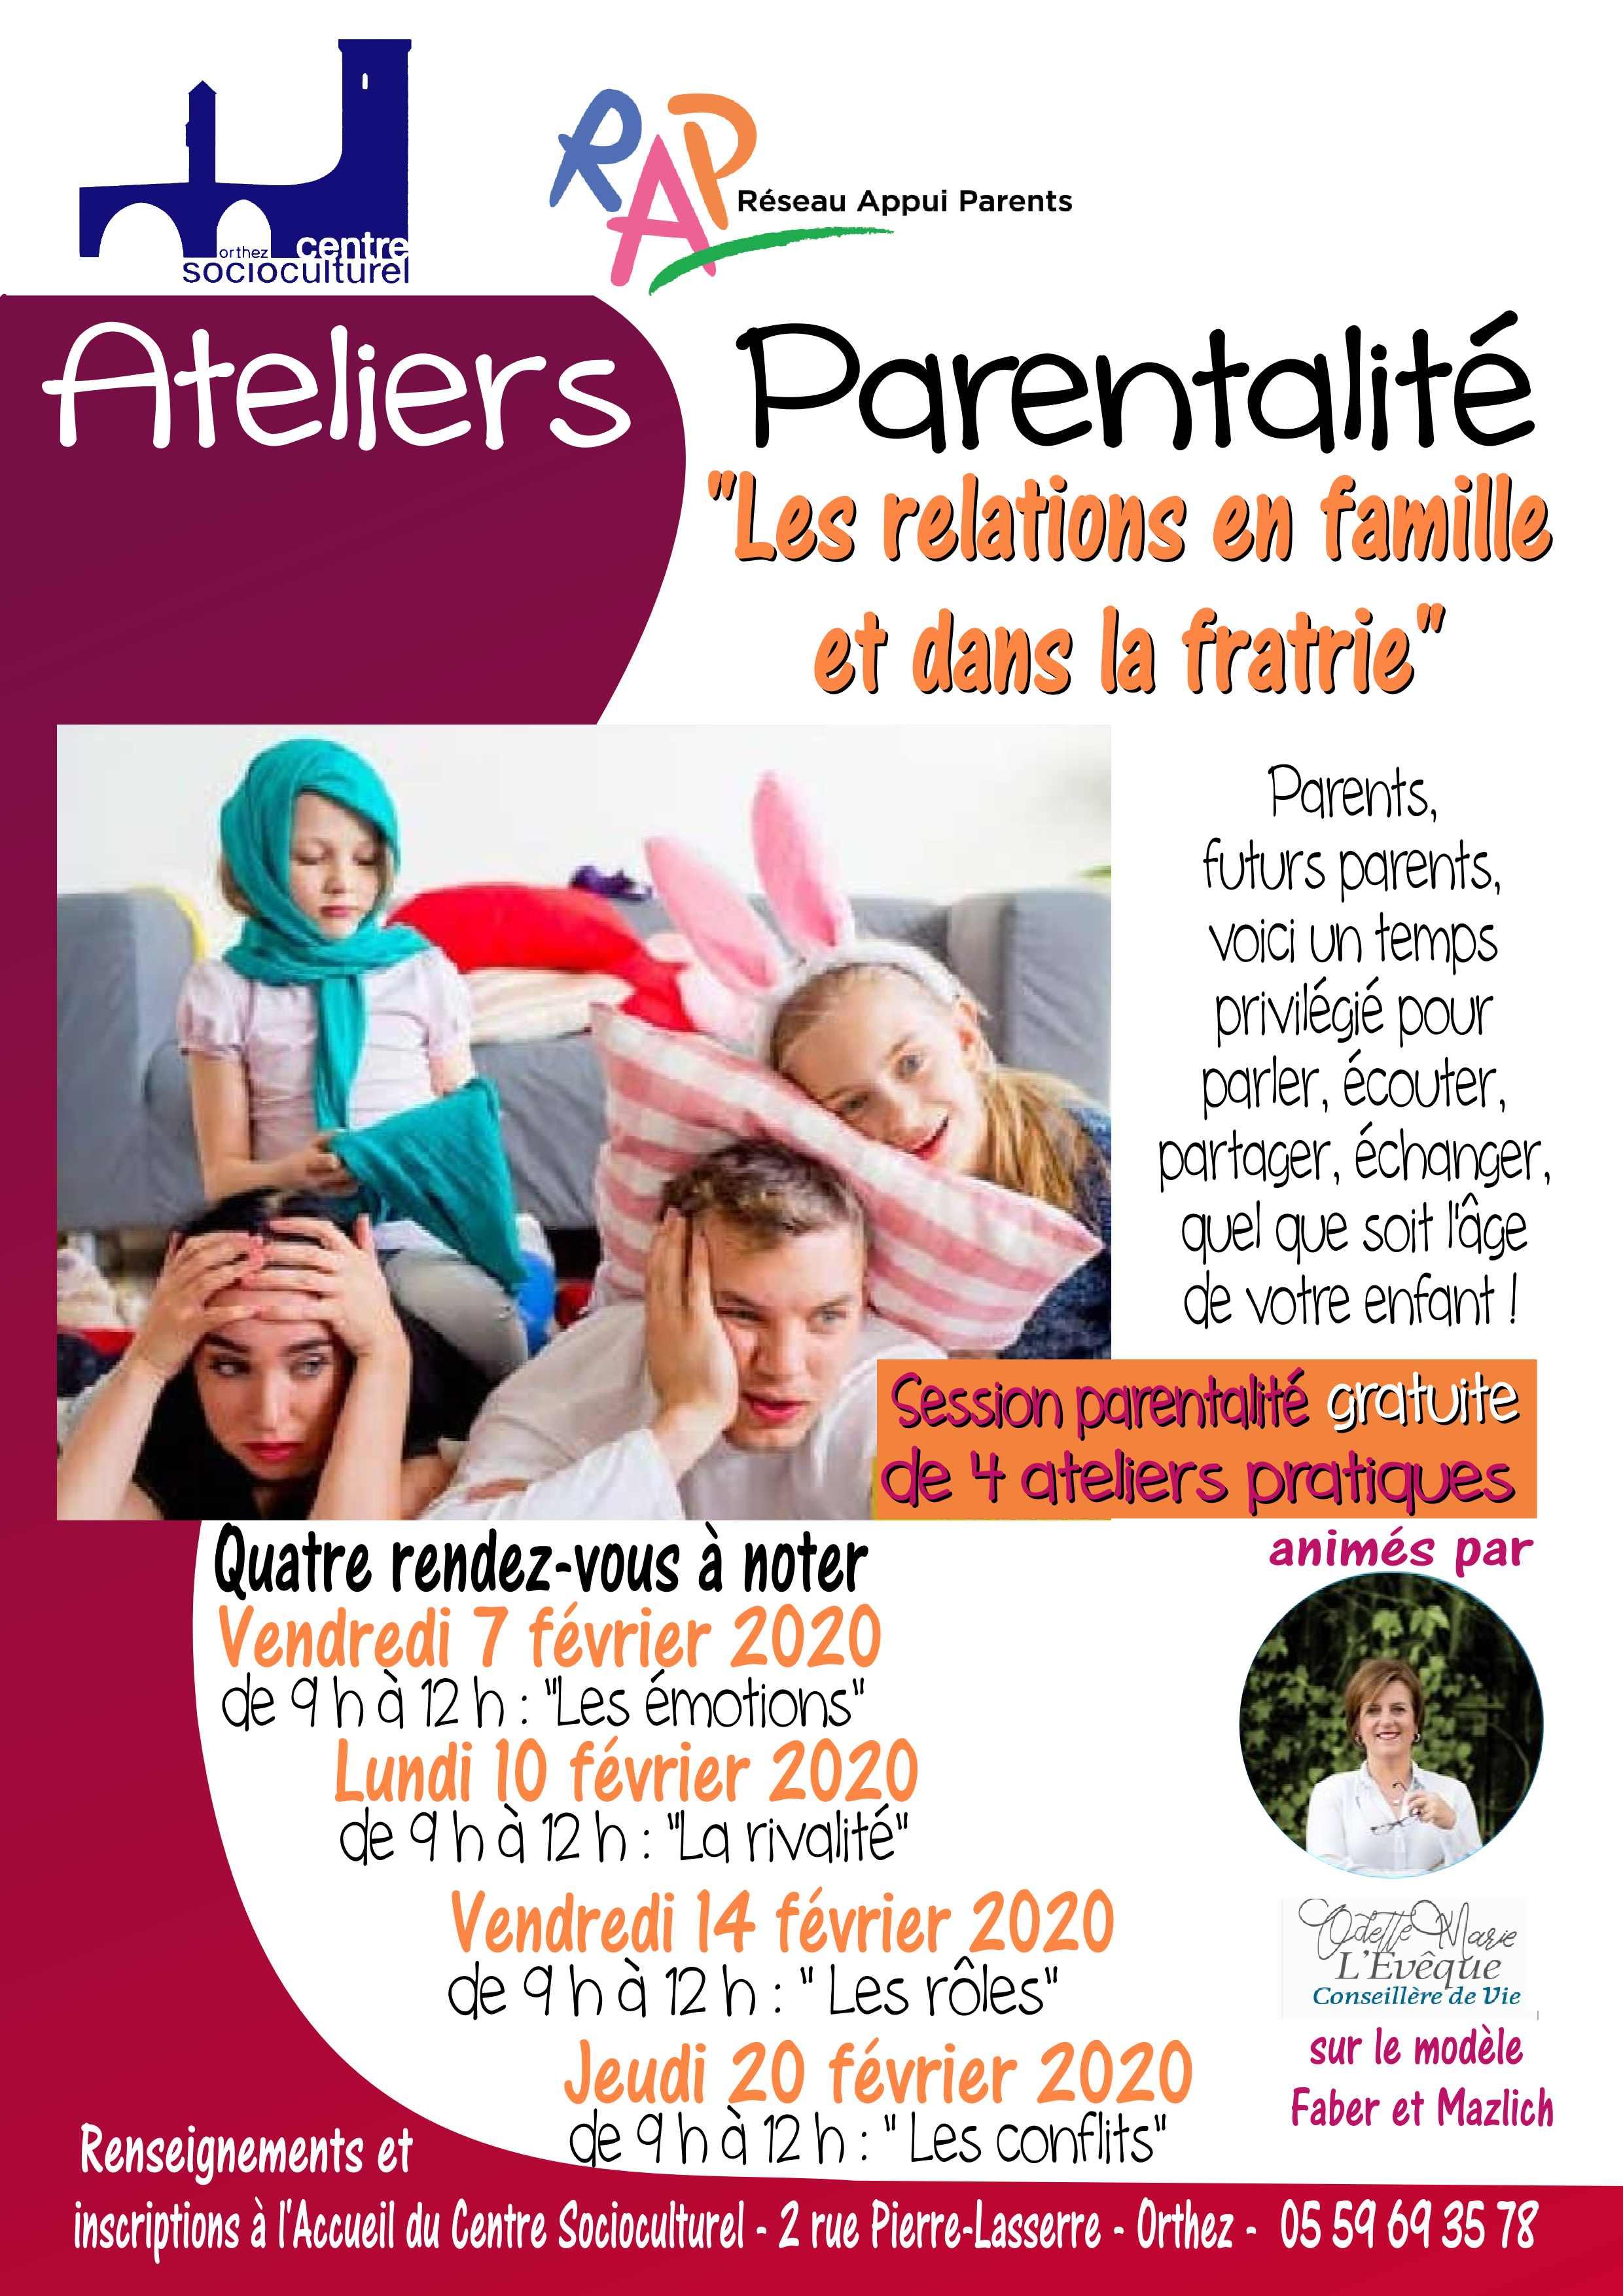 Atelier-Parentalite-Bienveillante